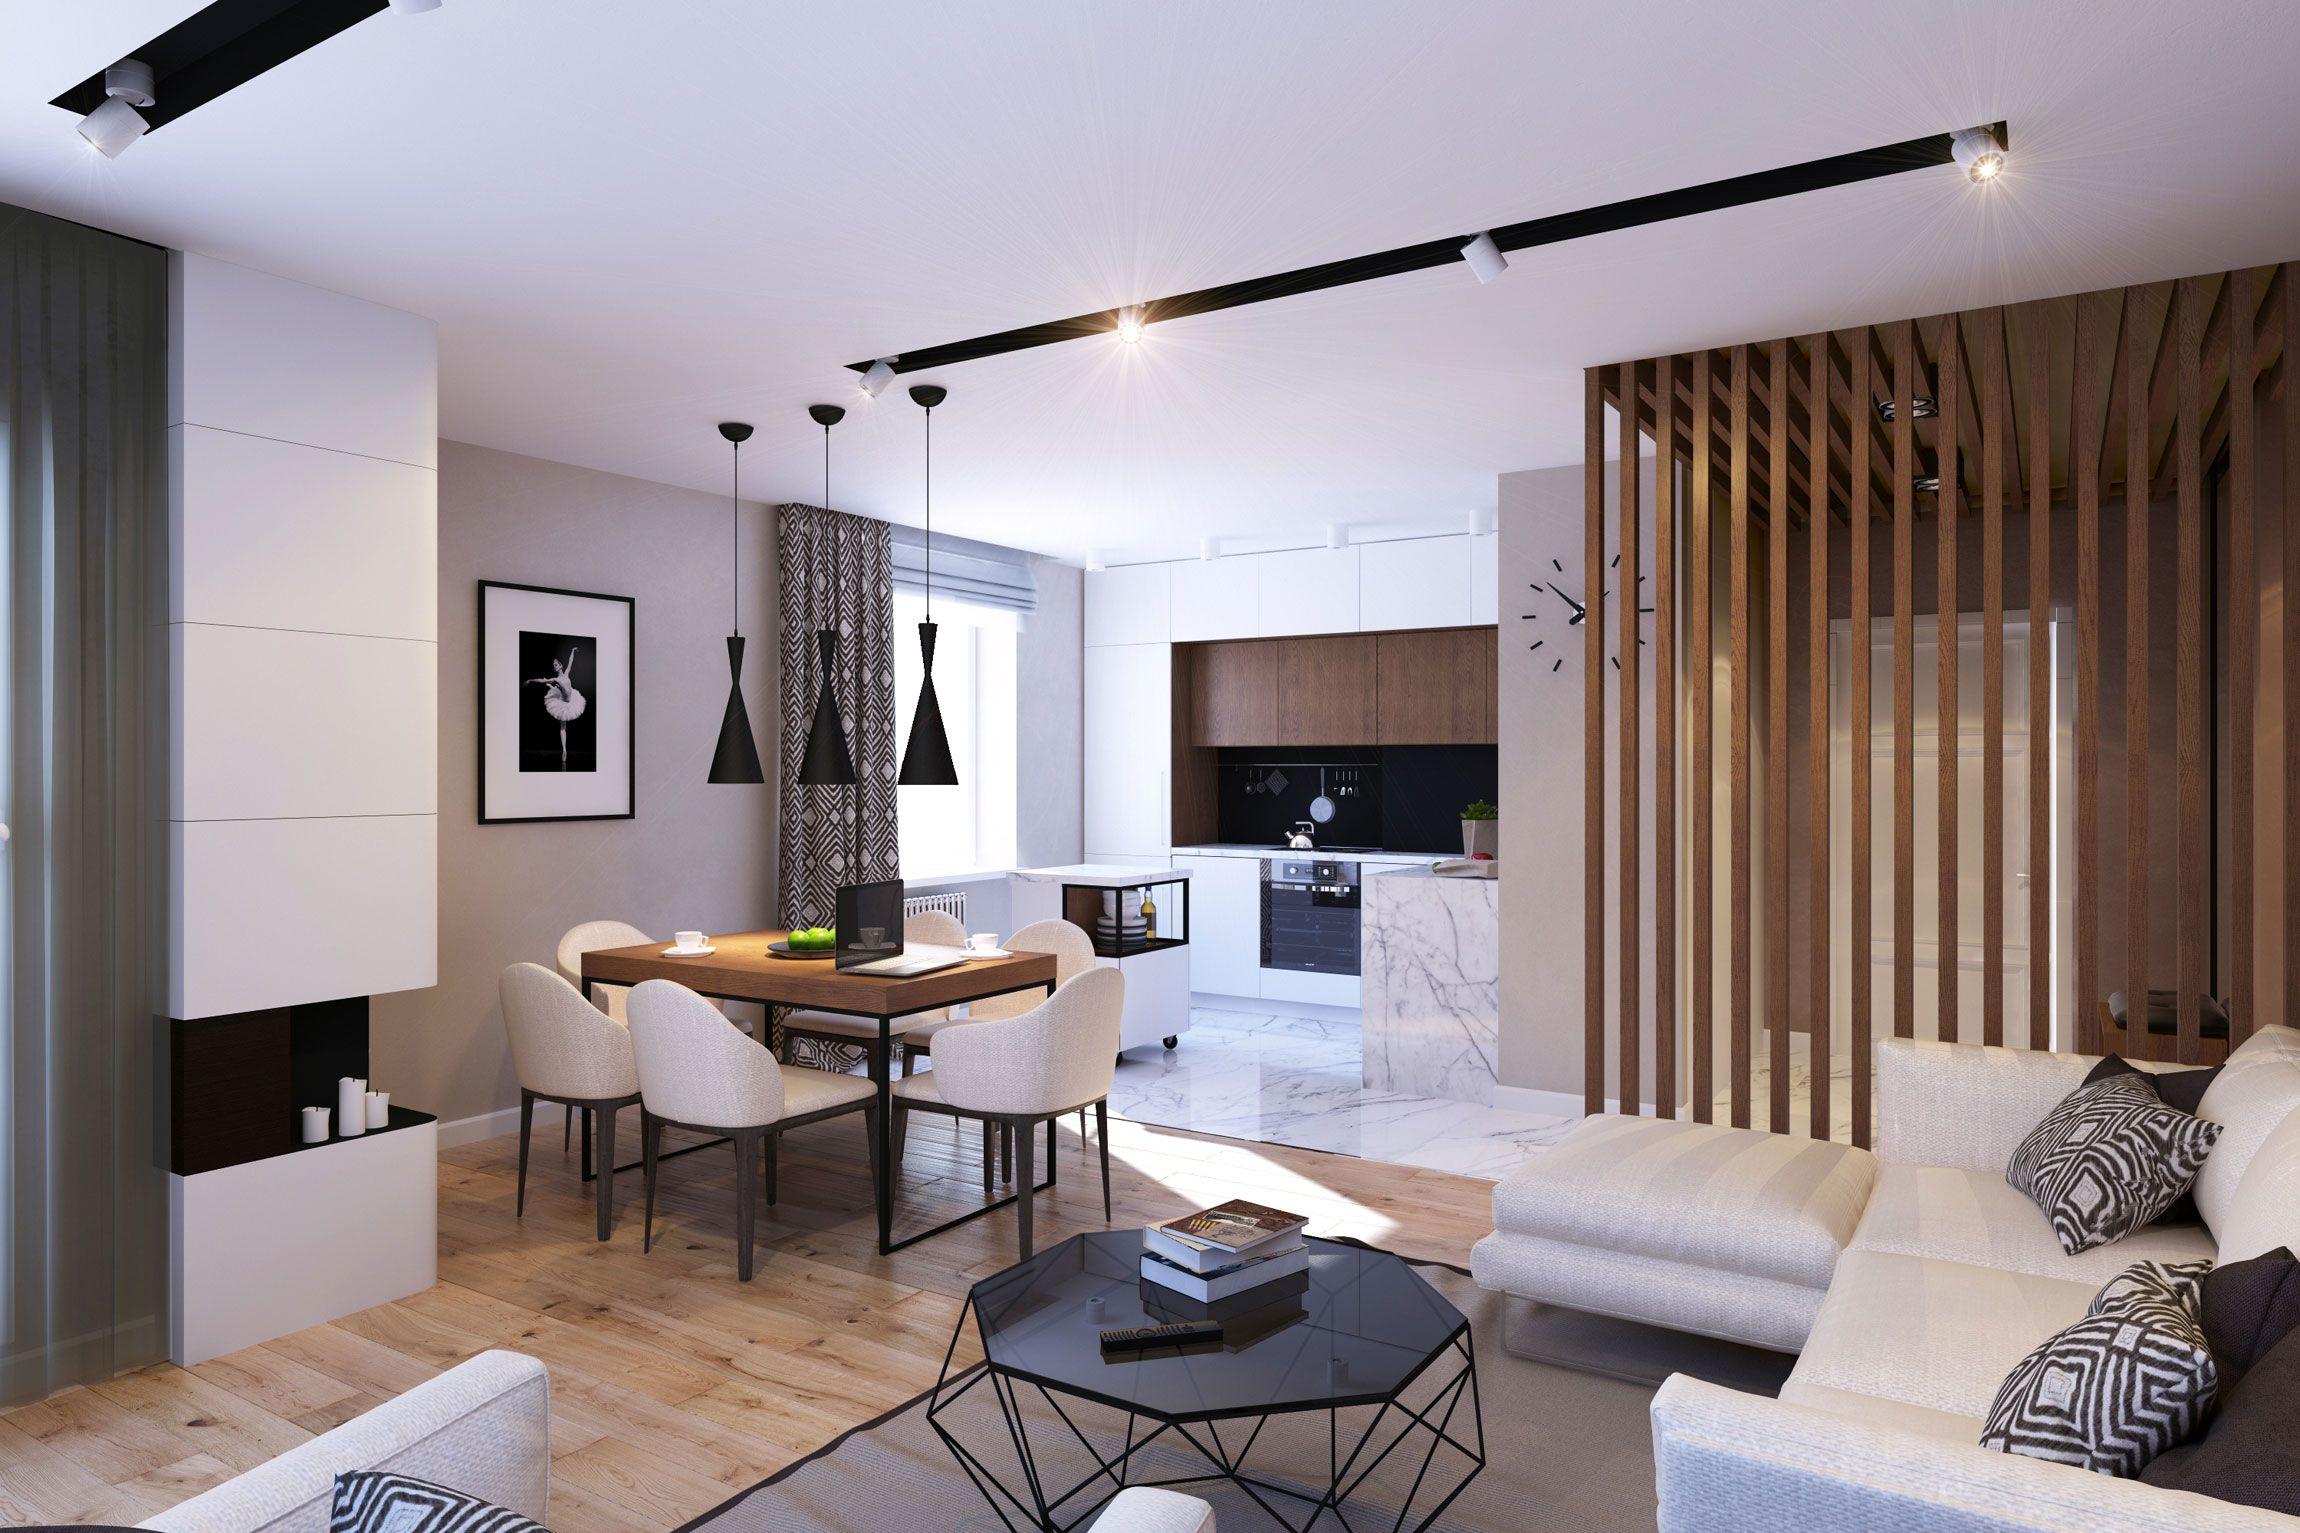 Bogatyrskiy-Modern-Apartment-04